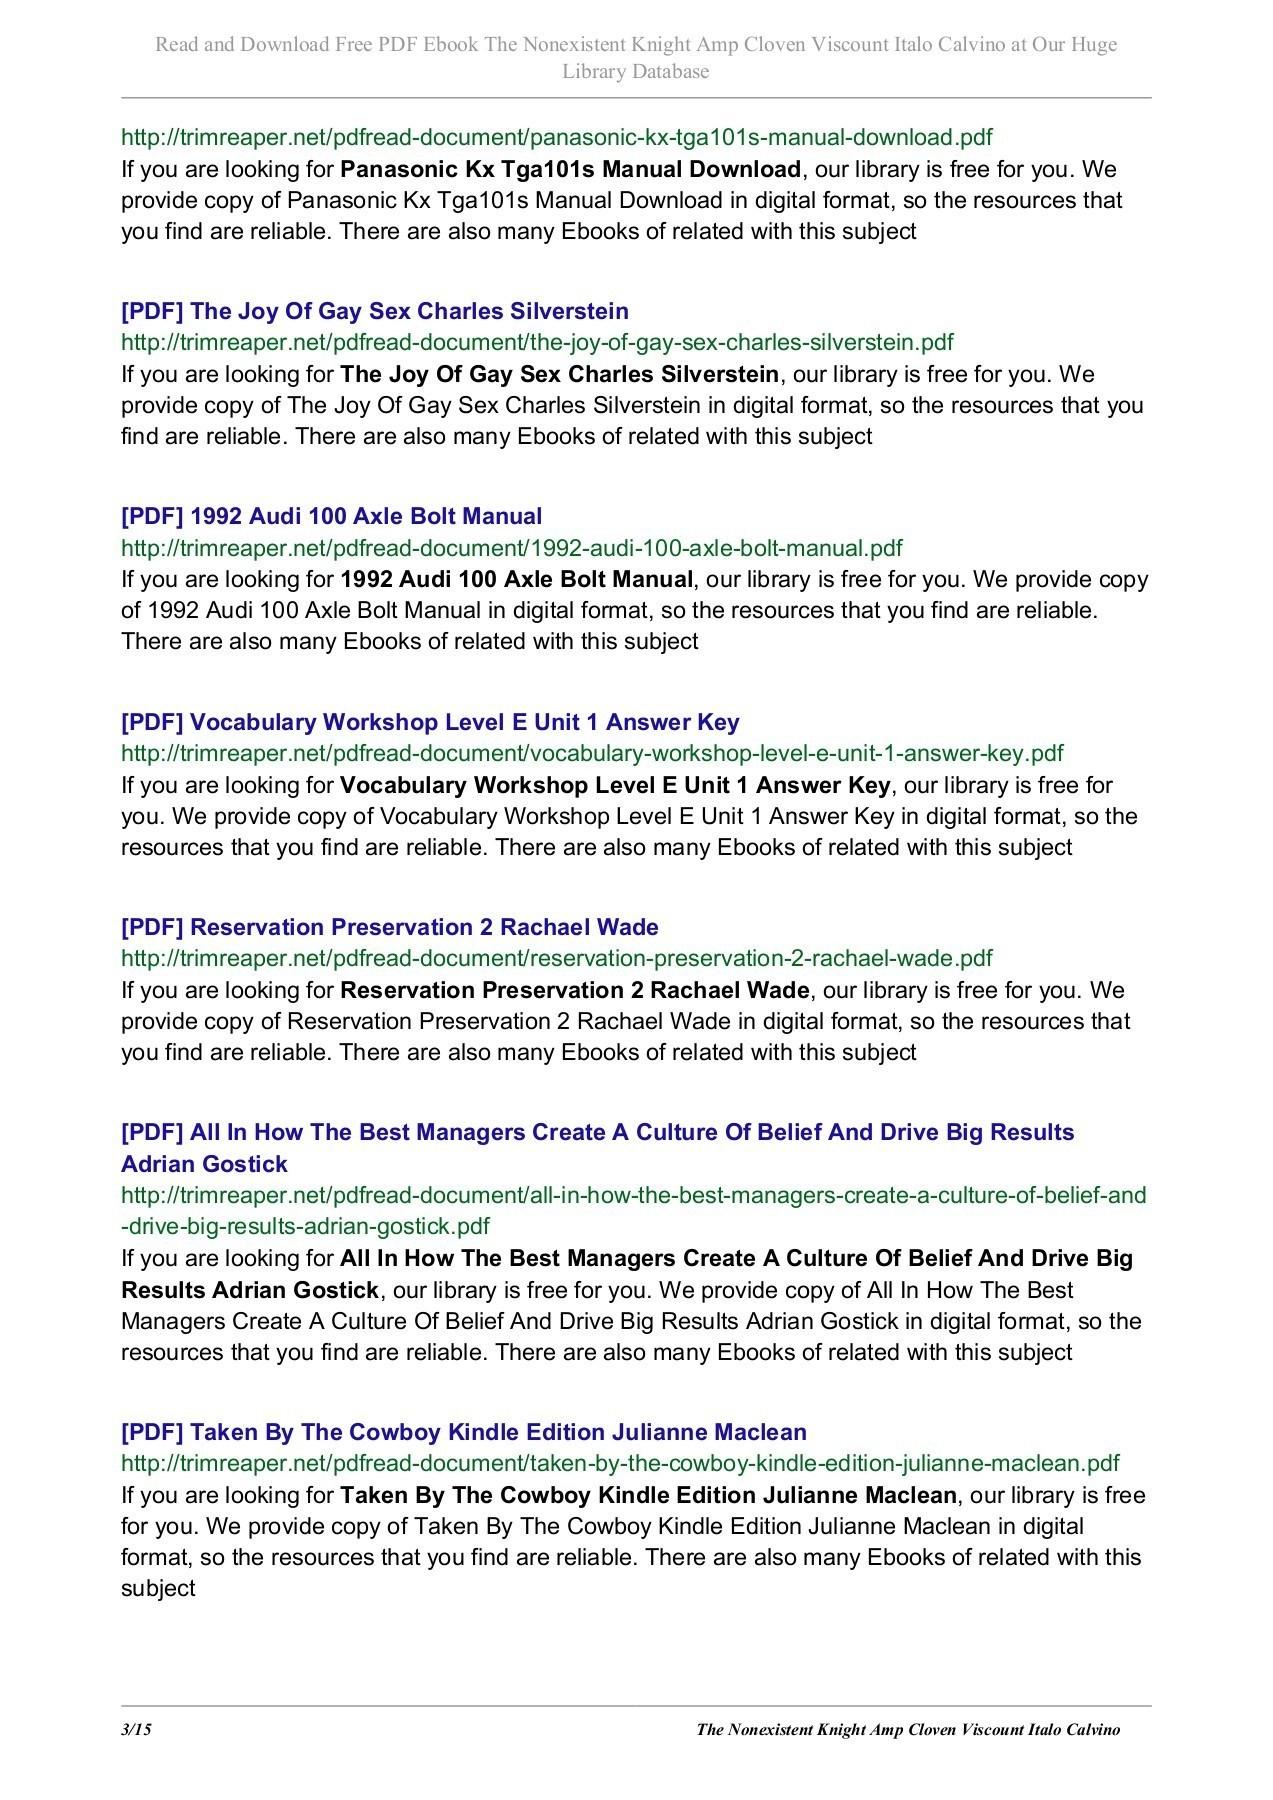 1 C2 prova 1 gab texml 1 C2 prova 1 gab pdf 2009jun08 manuscrito 1 página